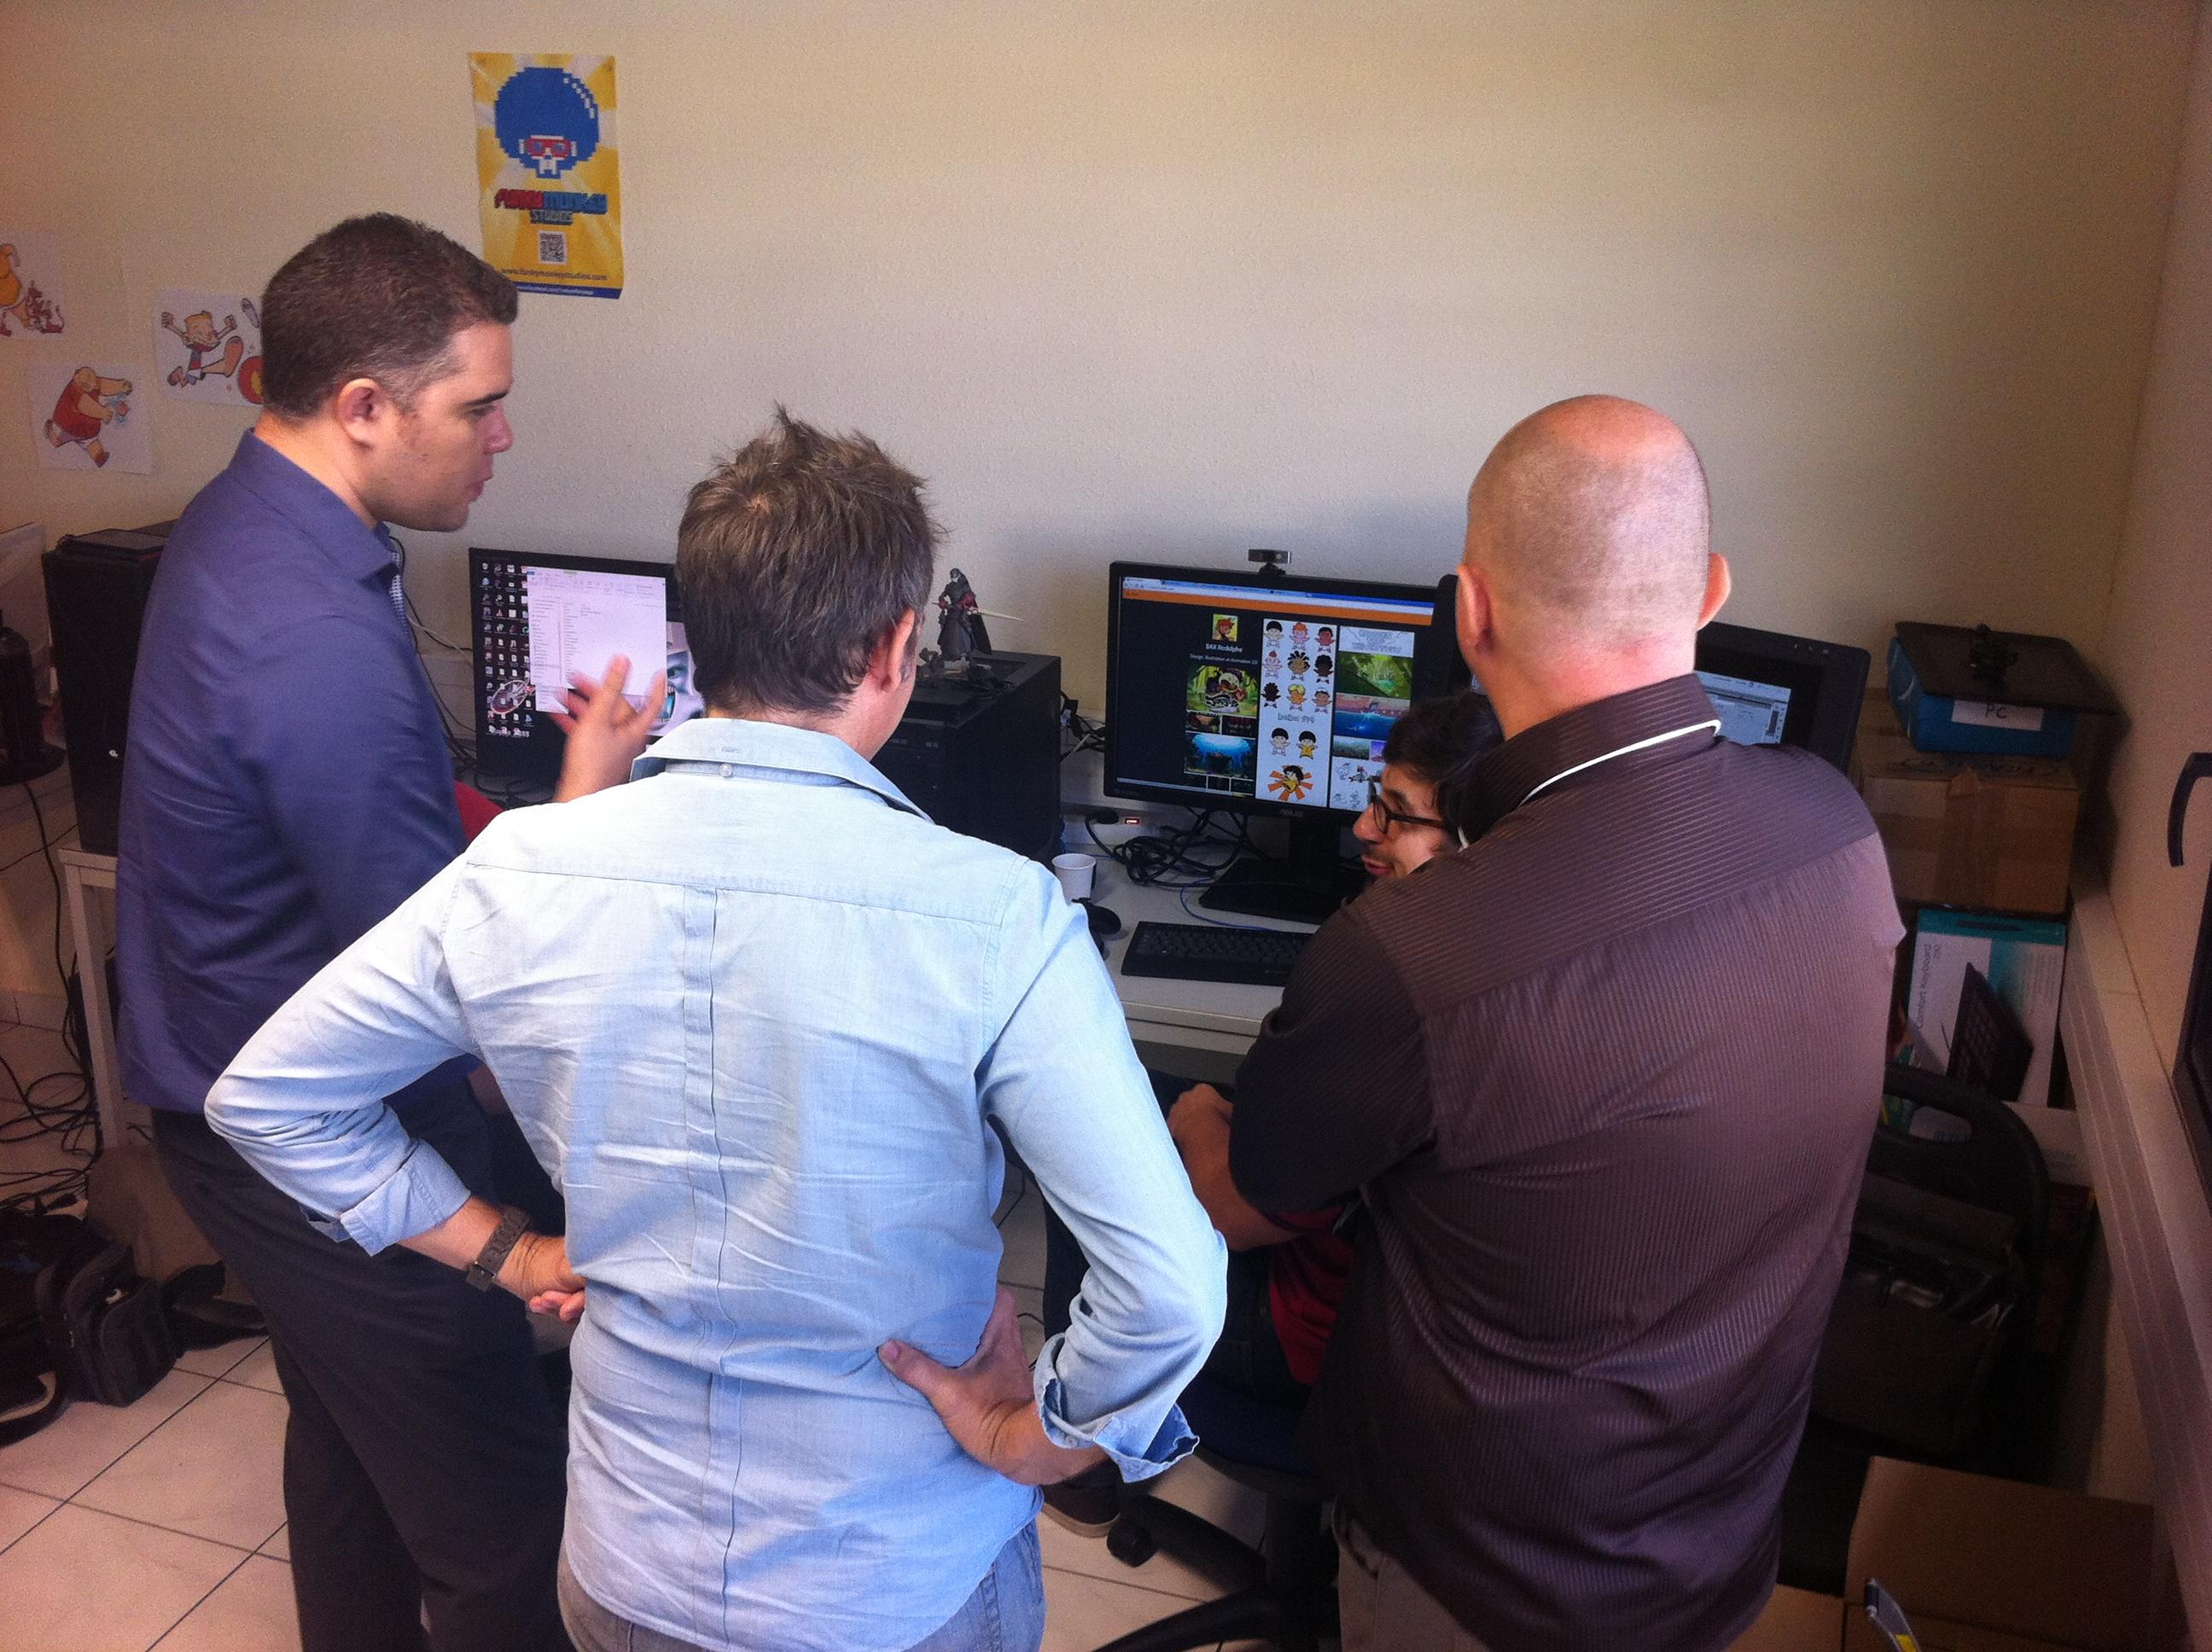 Understanding Game Design & Teaching through Conveyance